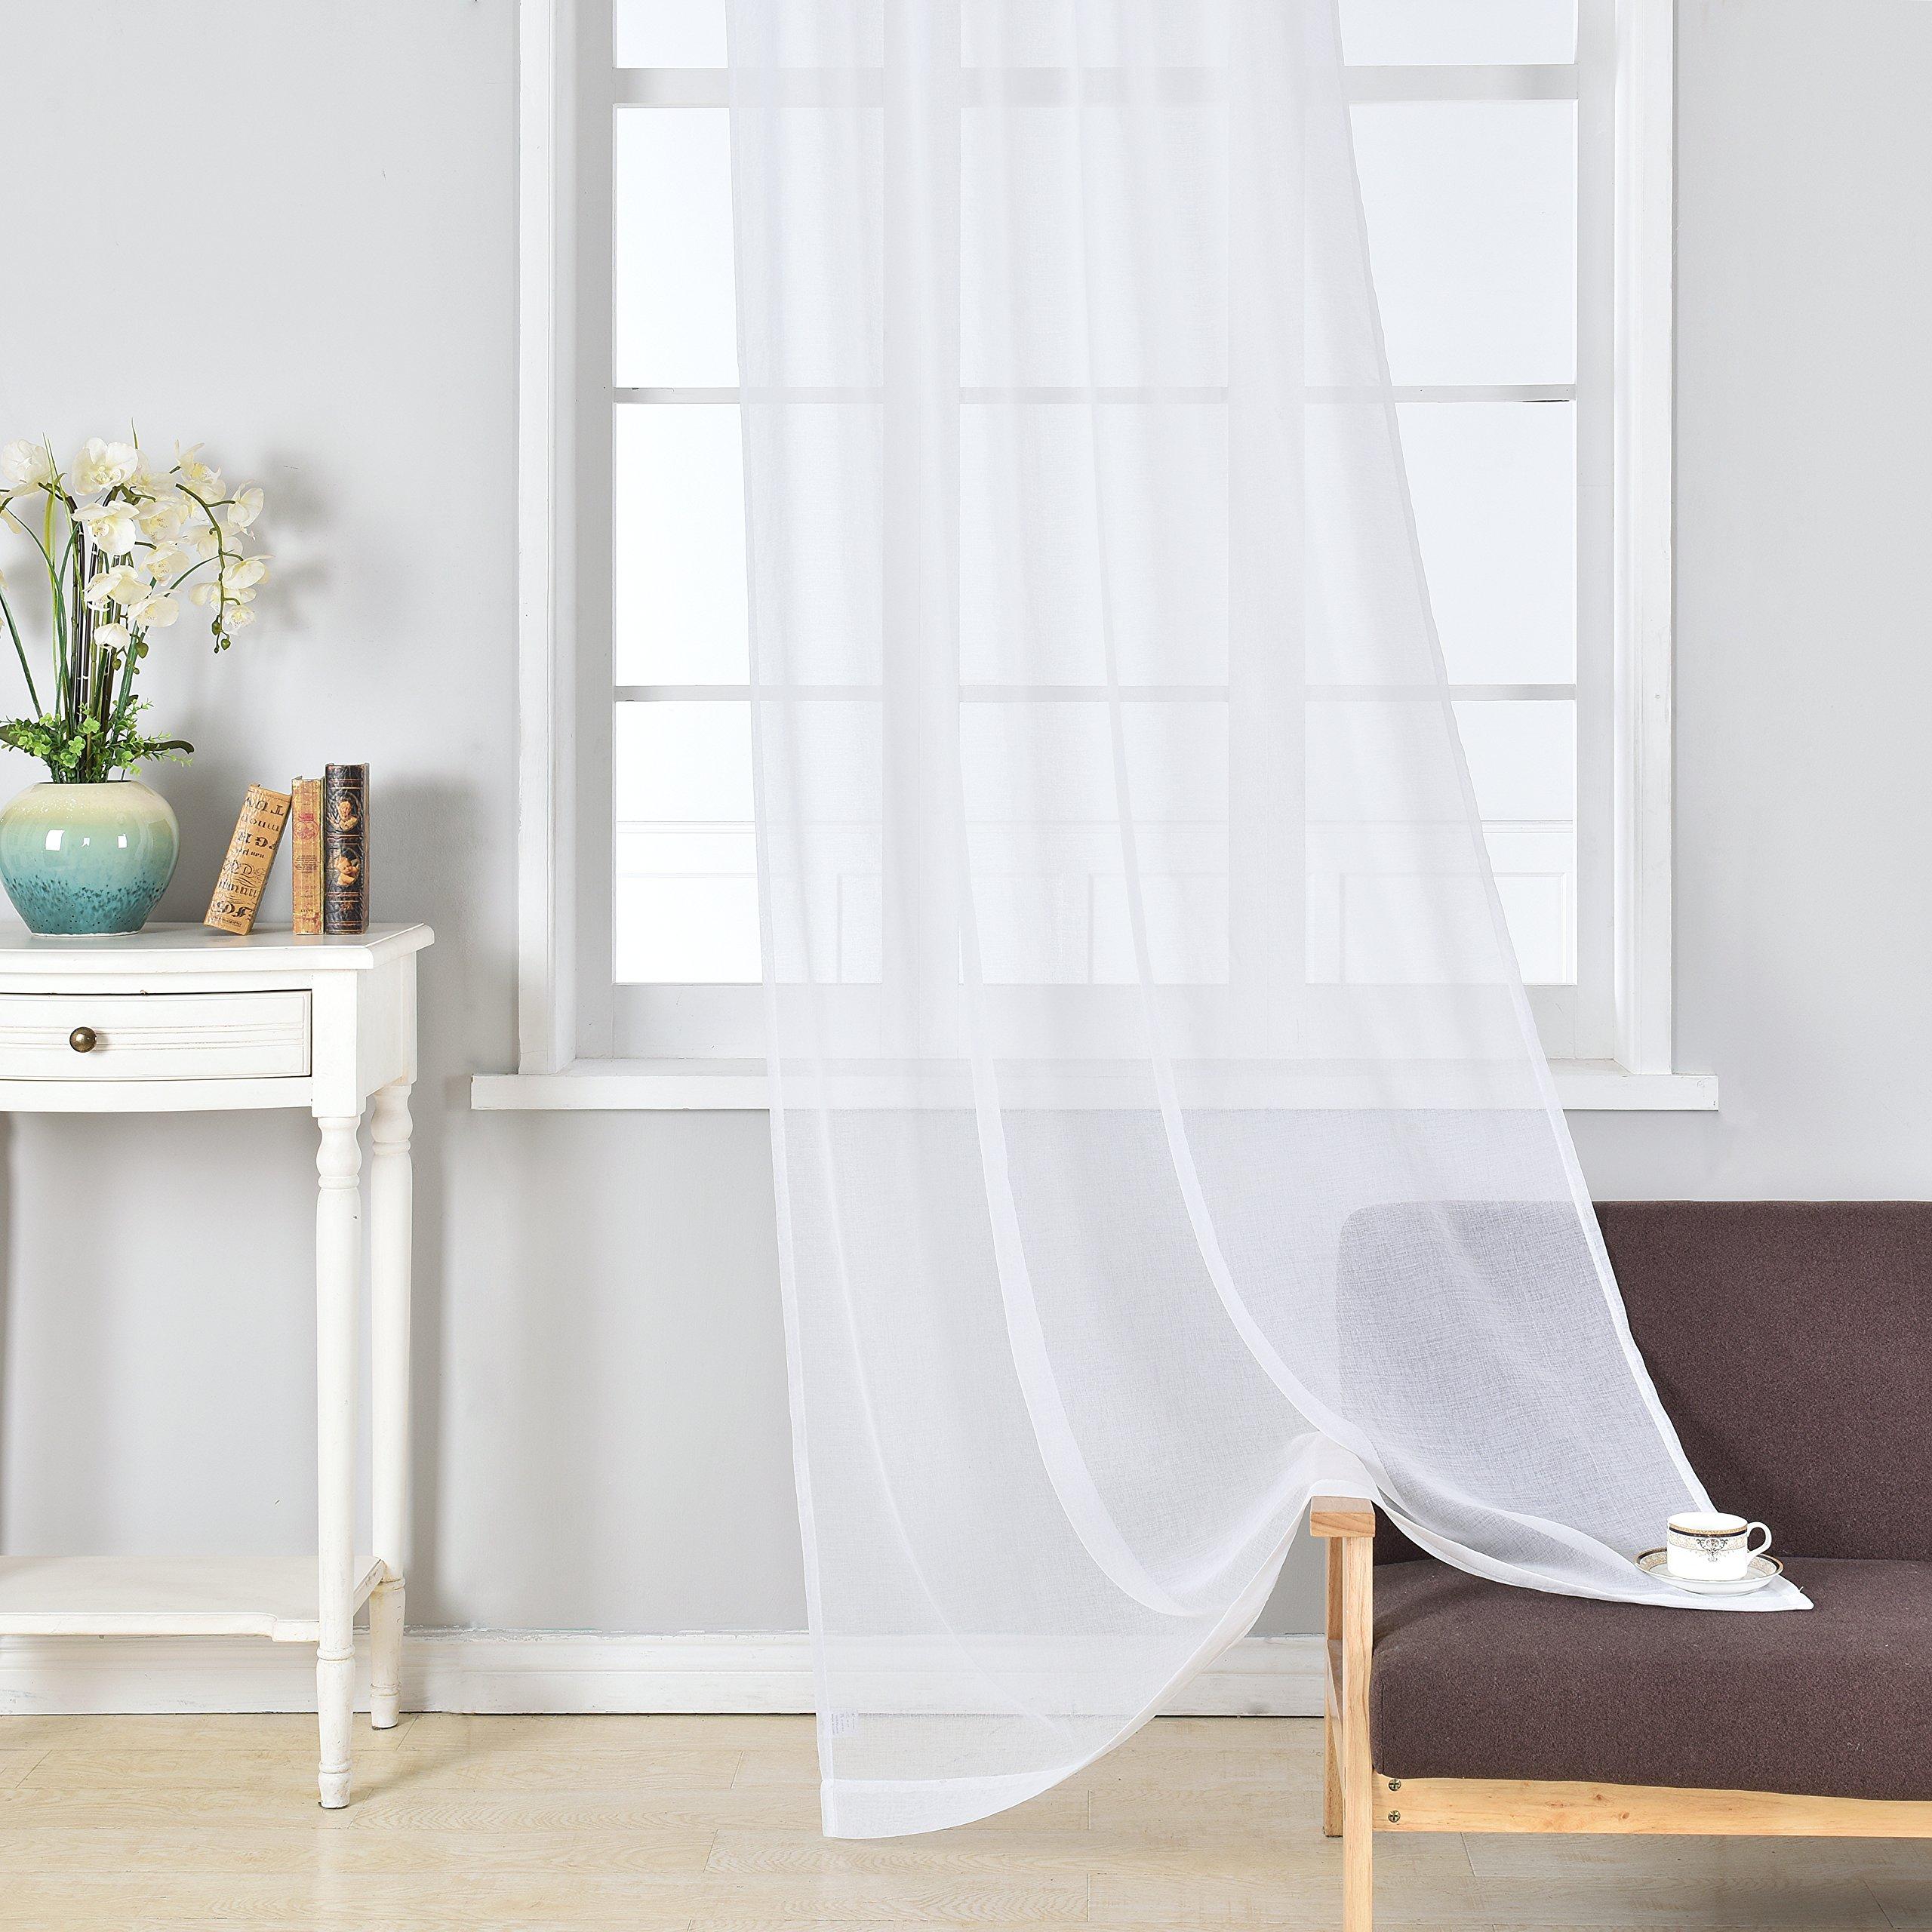 DWCN White Sheer Curtains Linen Look Semi Transparent